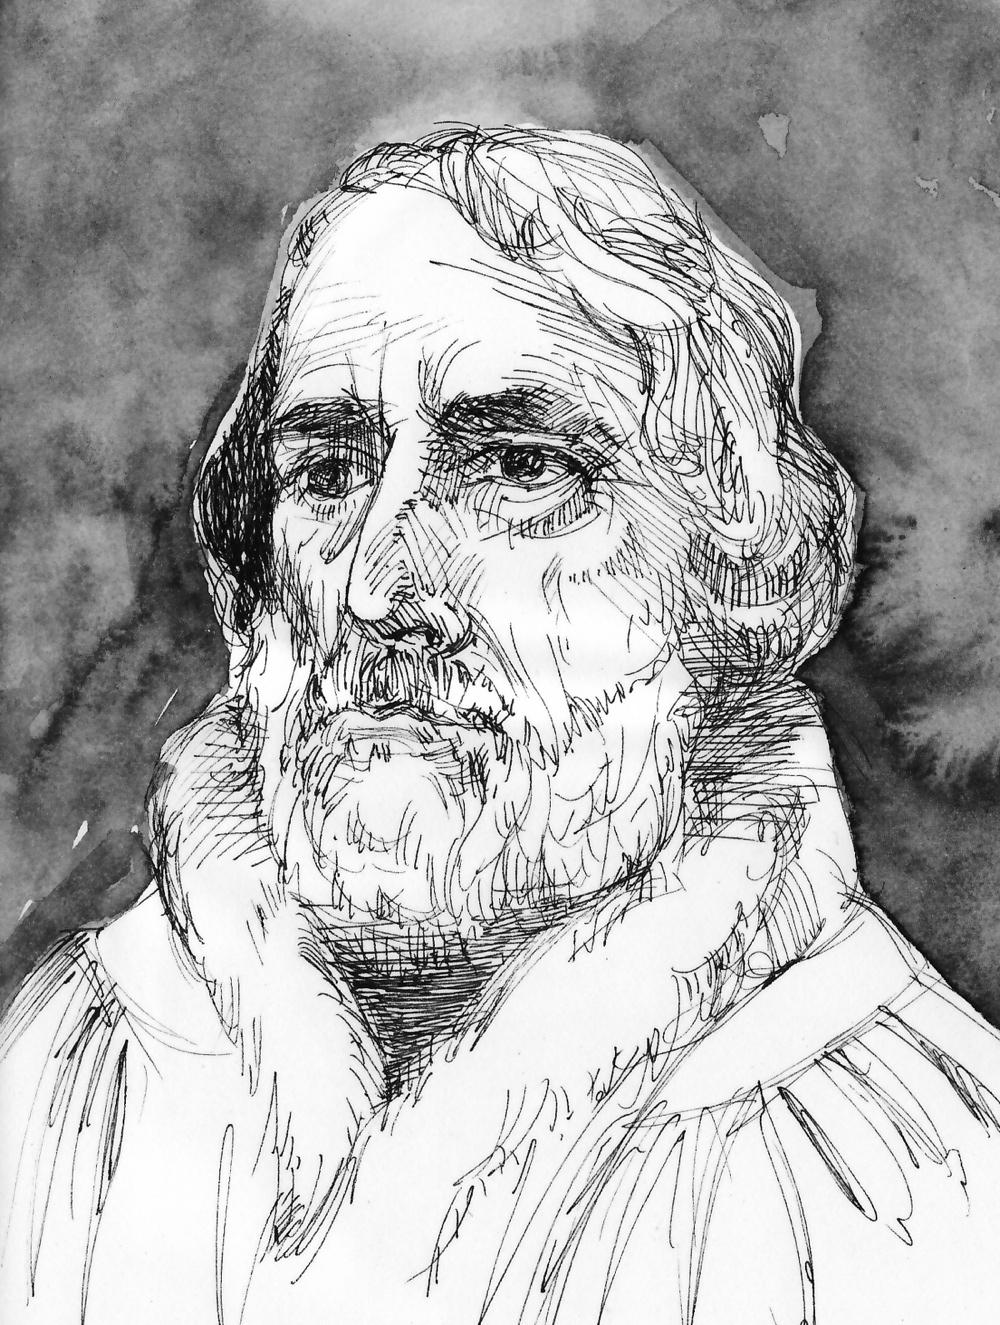 Johann-Arndt-Illustration-by-D.Klitsie